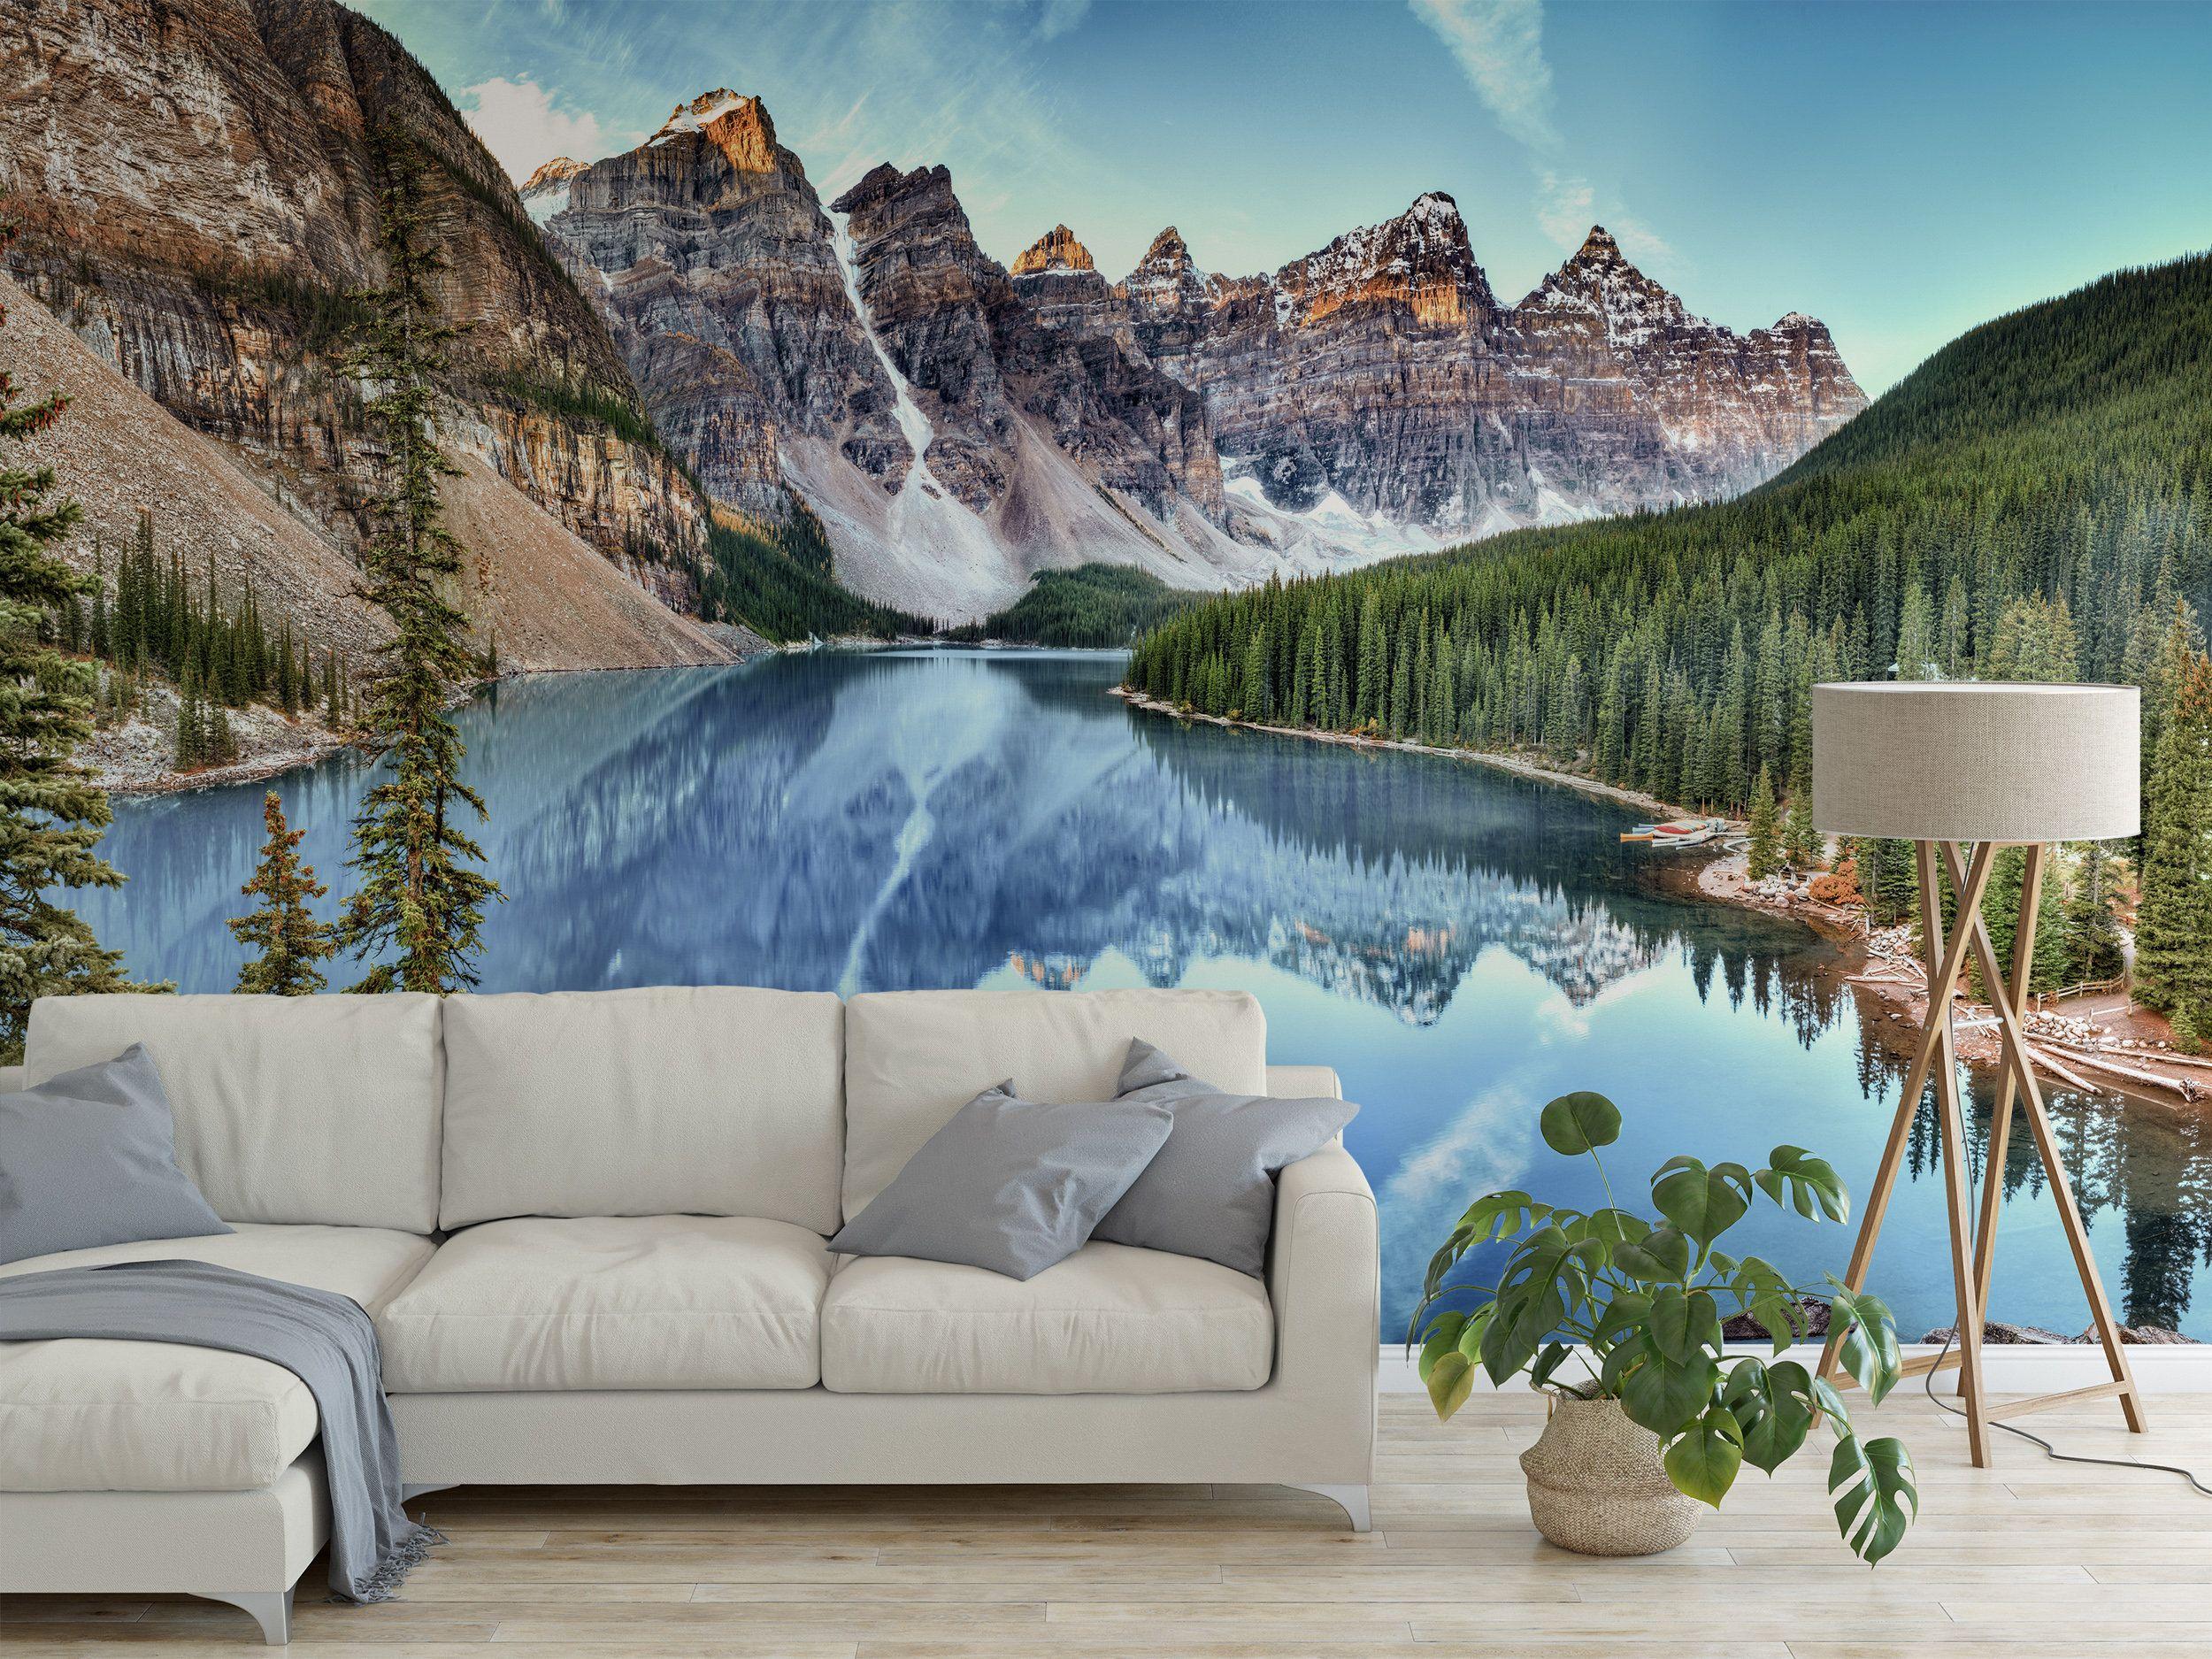 Beautiful Wallpaper High Quality Wall - 03b96ac416ed07e24a90d8de71c98053  Perfect Image Reference_356698.jpg